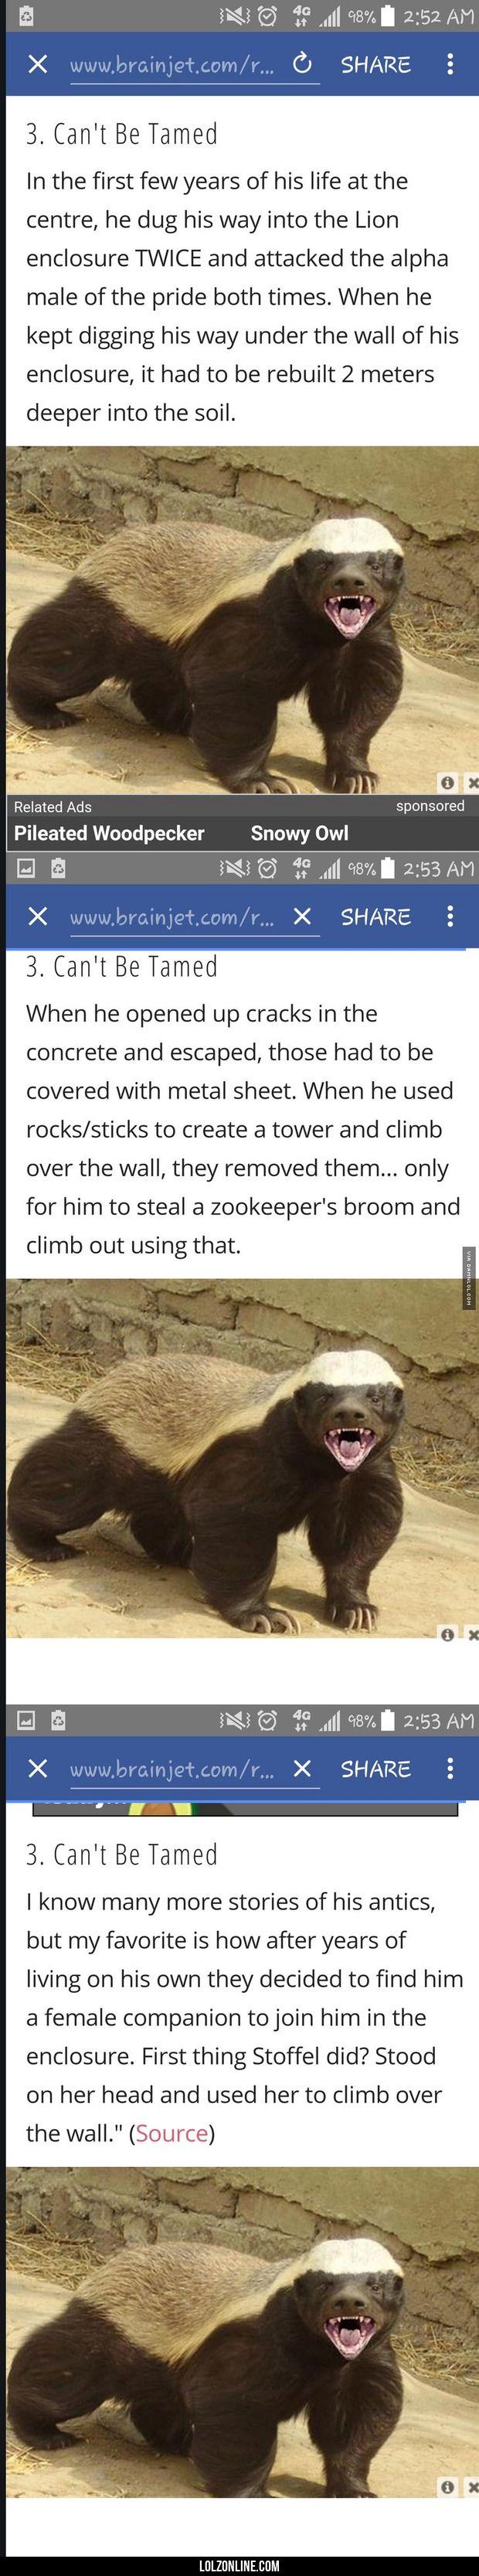 That Poor Lion#funny #lol #lolzonline